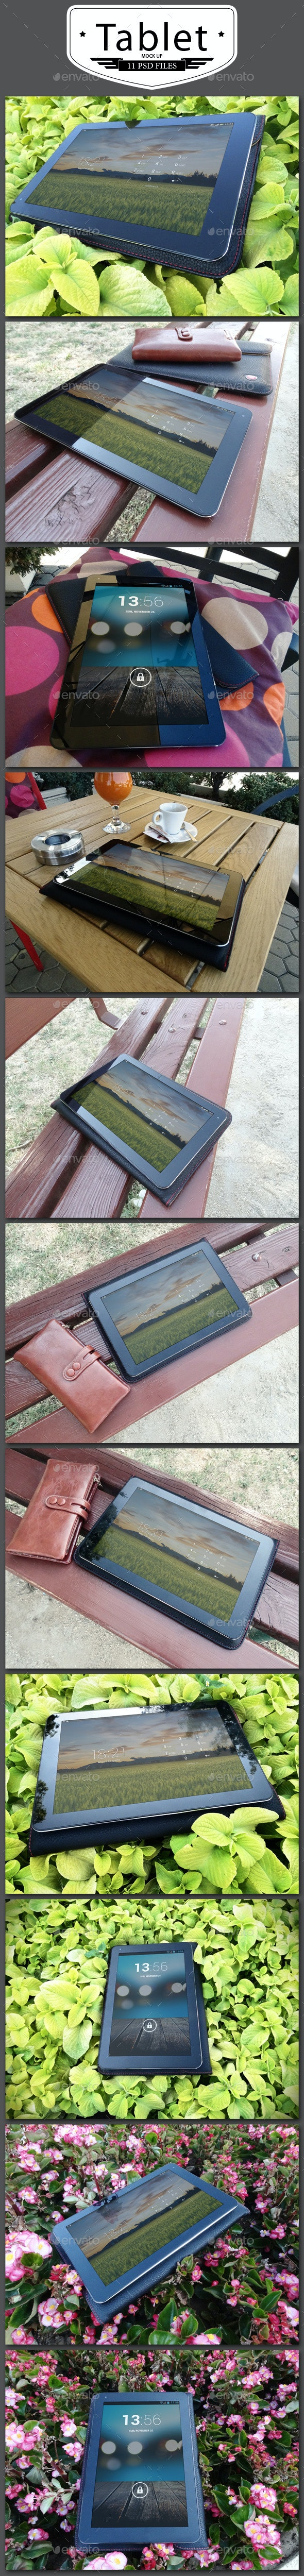 11 Tablet Mock Up - Product Mock-Ups Graphics